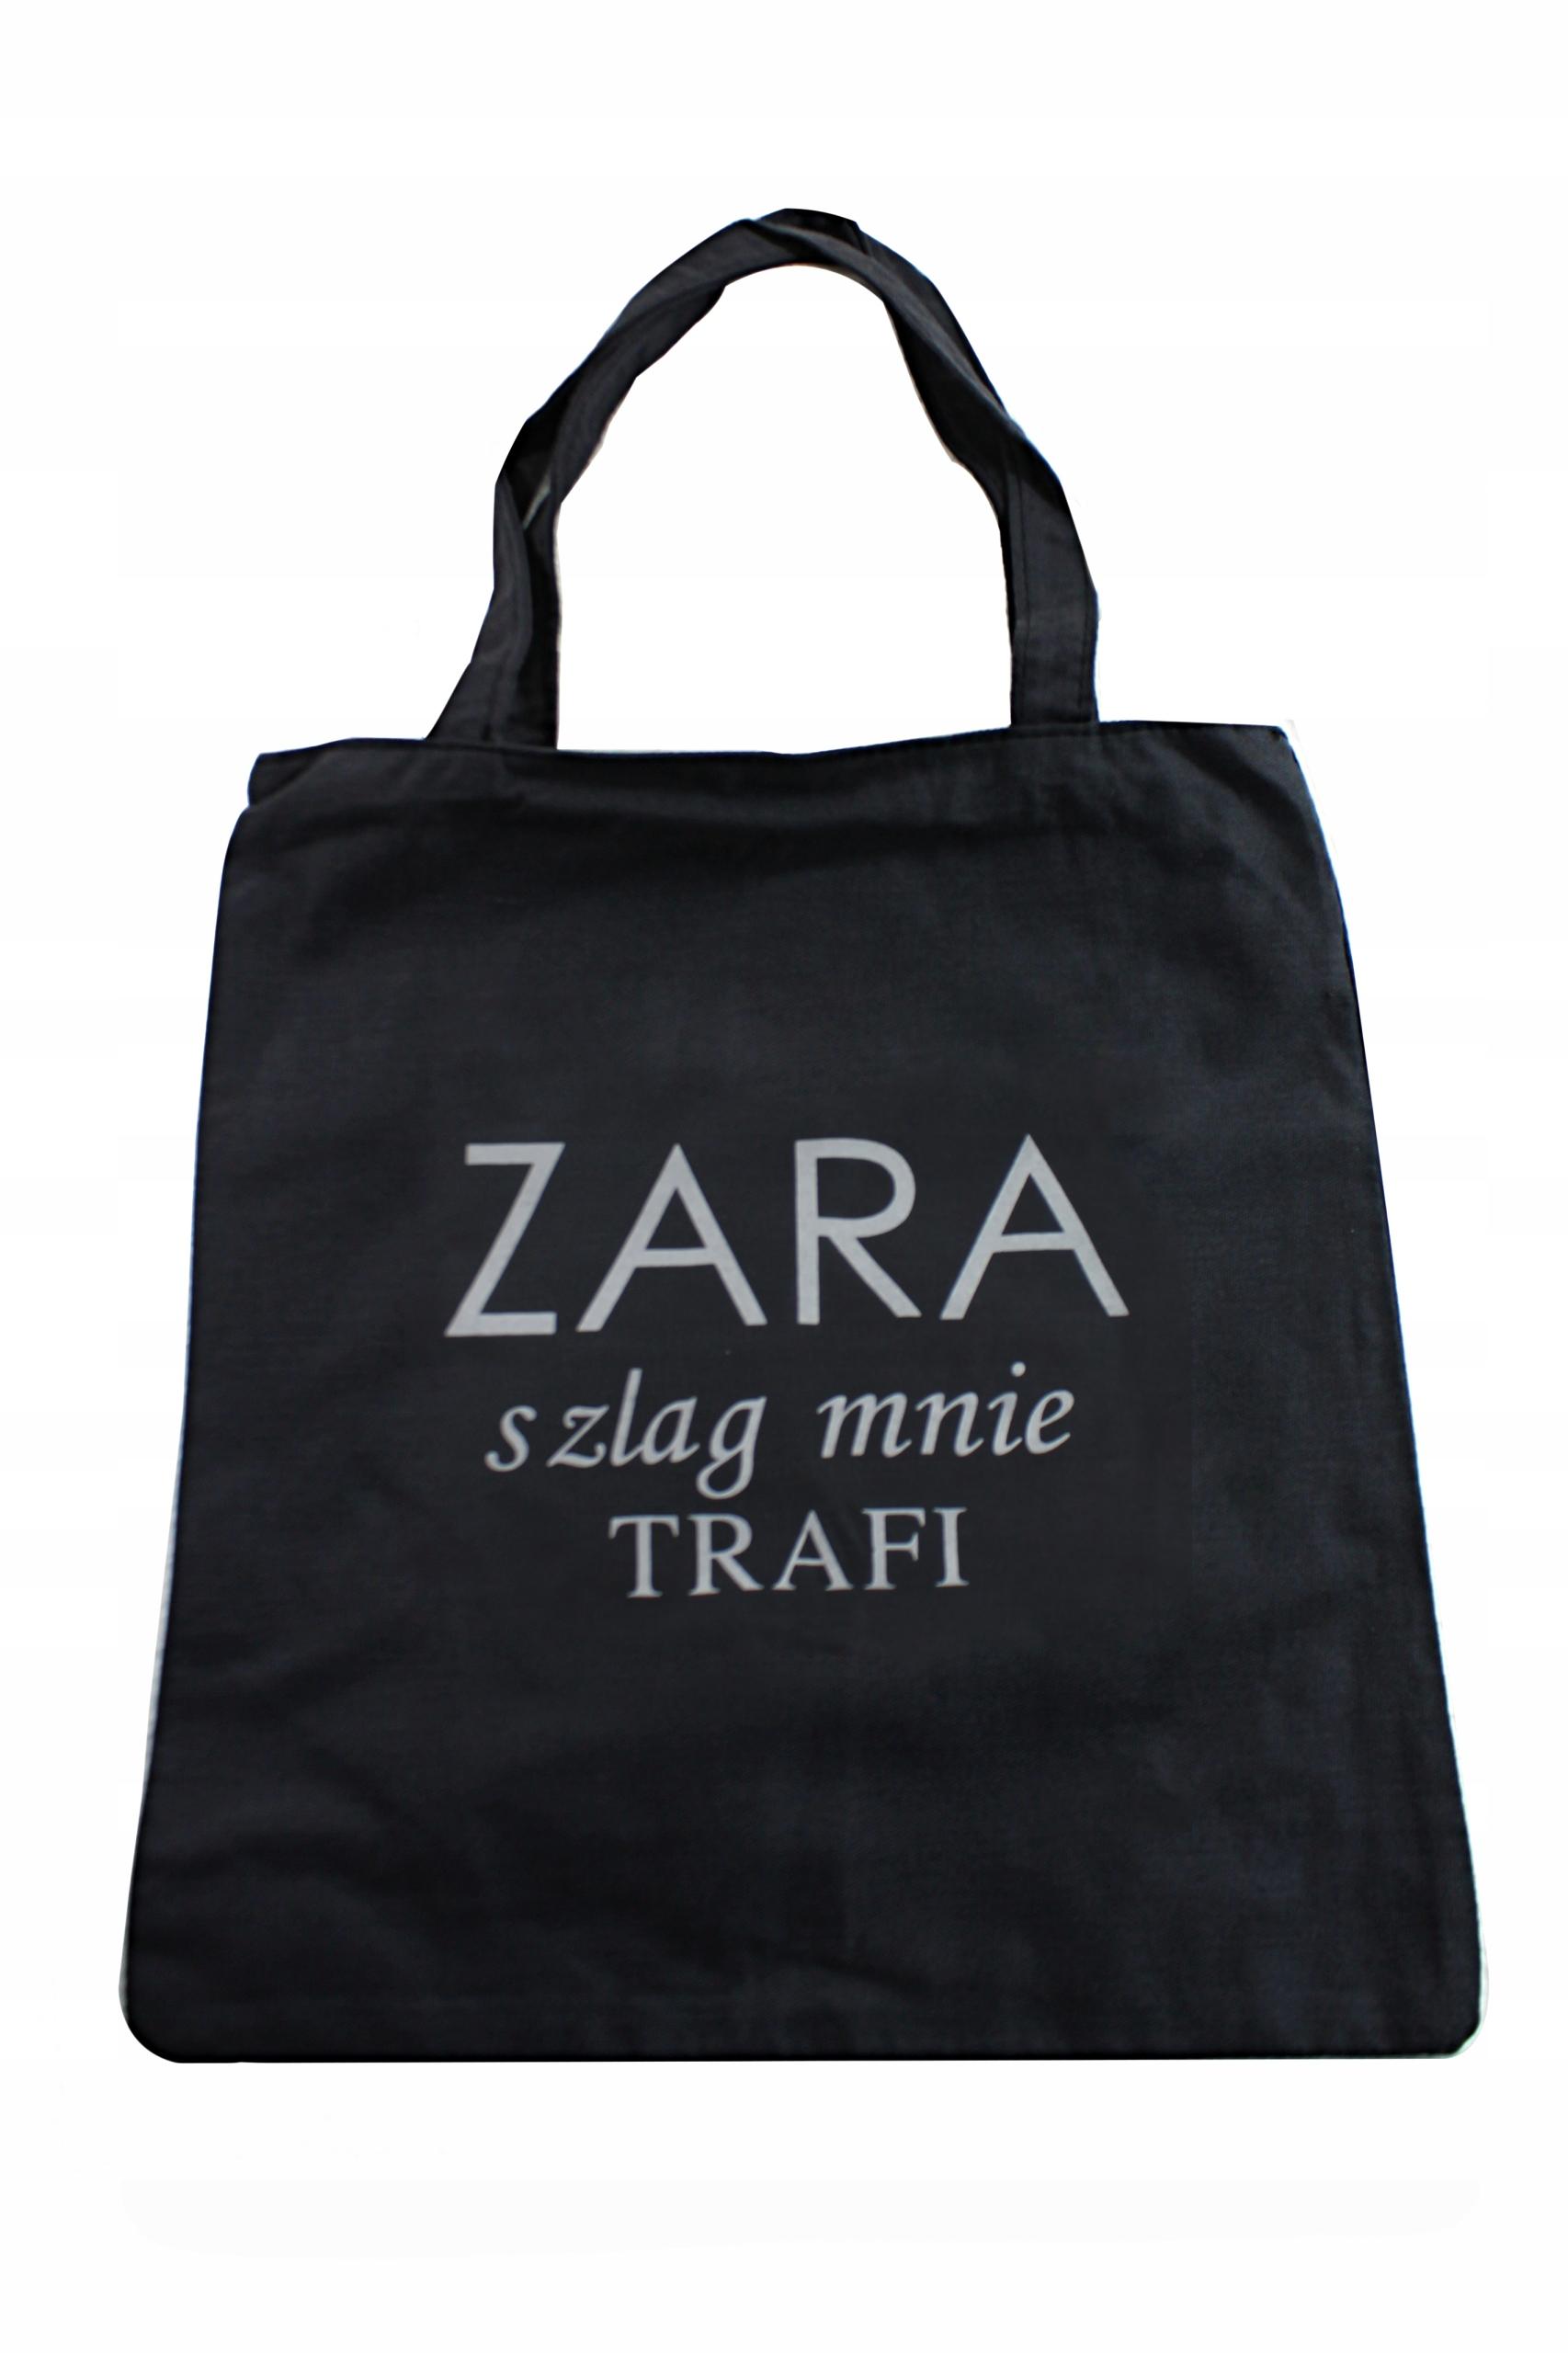 e373cc9f98875 Torba Miejska ZARA Torebka Damska Duża Promocja - 7535507929 ...